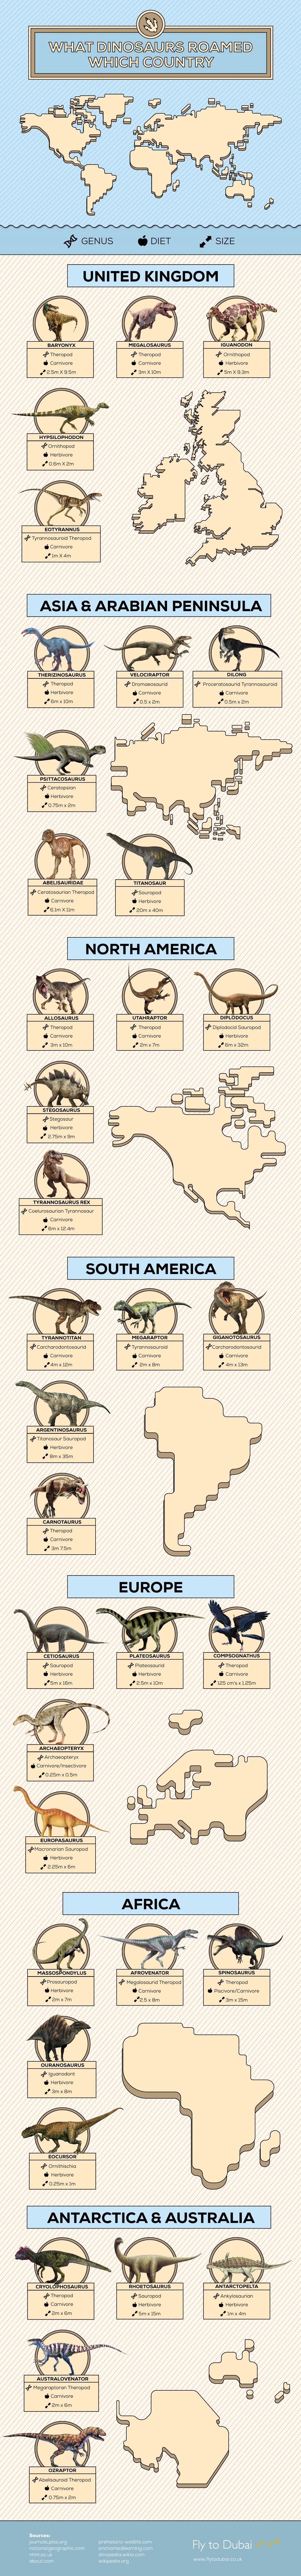 dinosaur infographic example